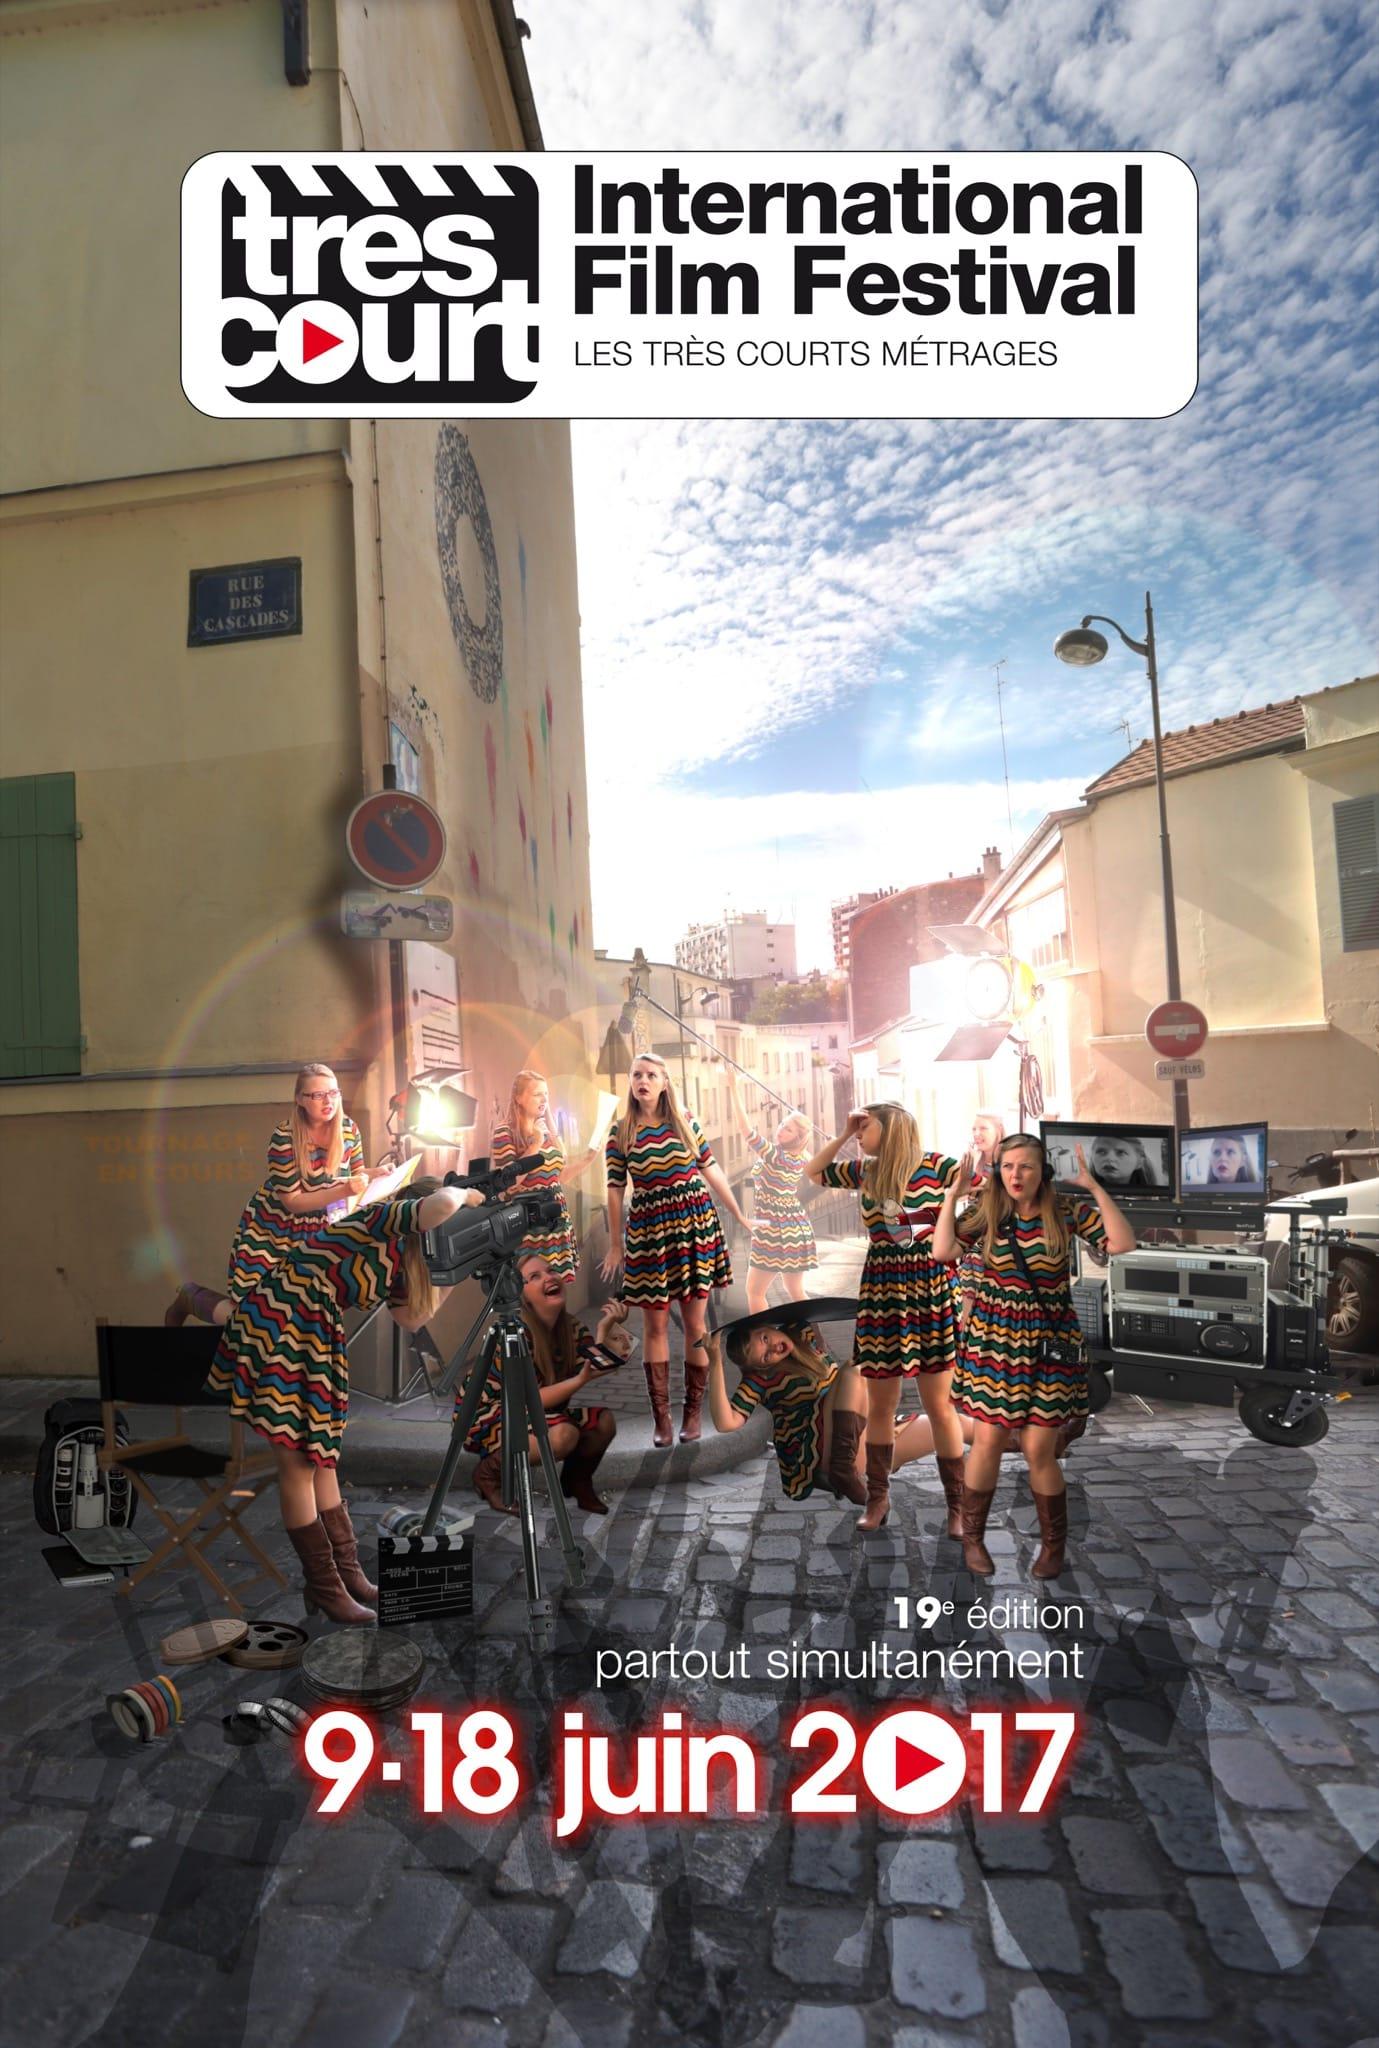 Tres Court International Film Festival 2017 affiche